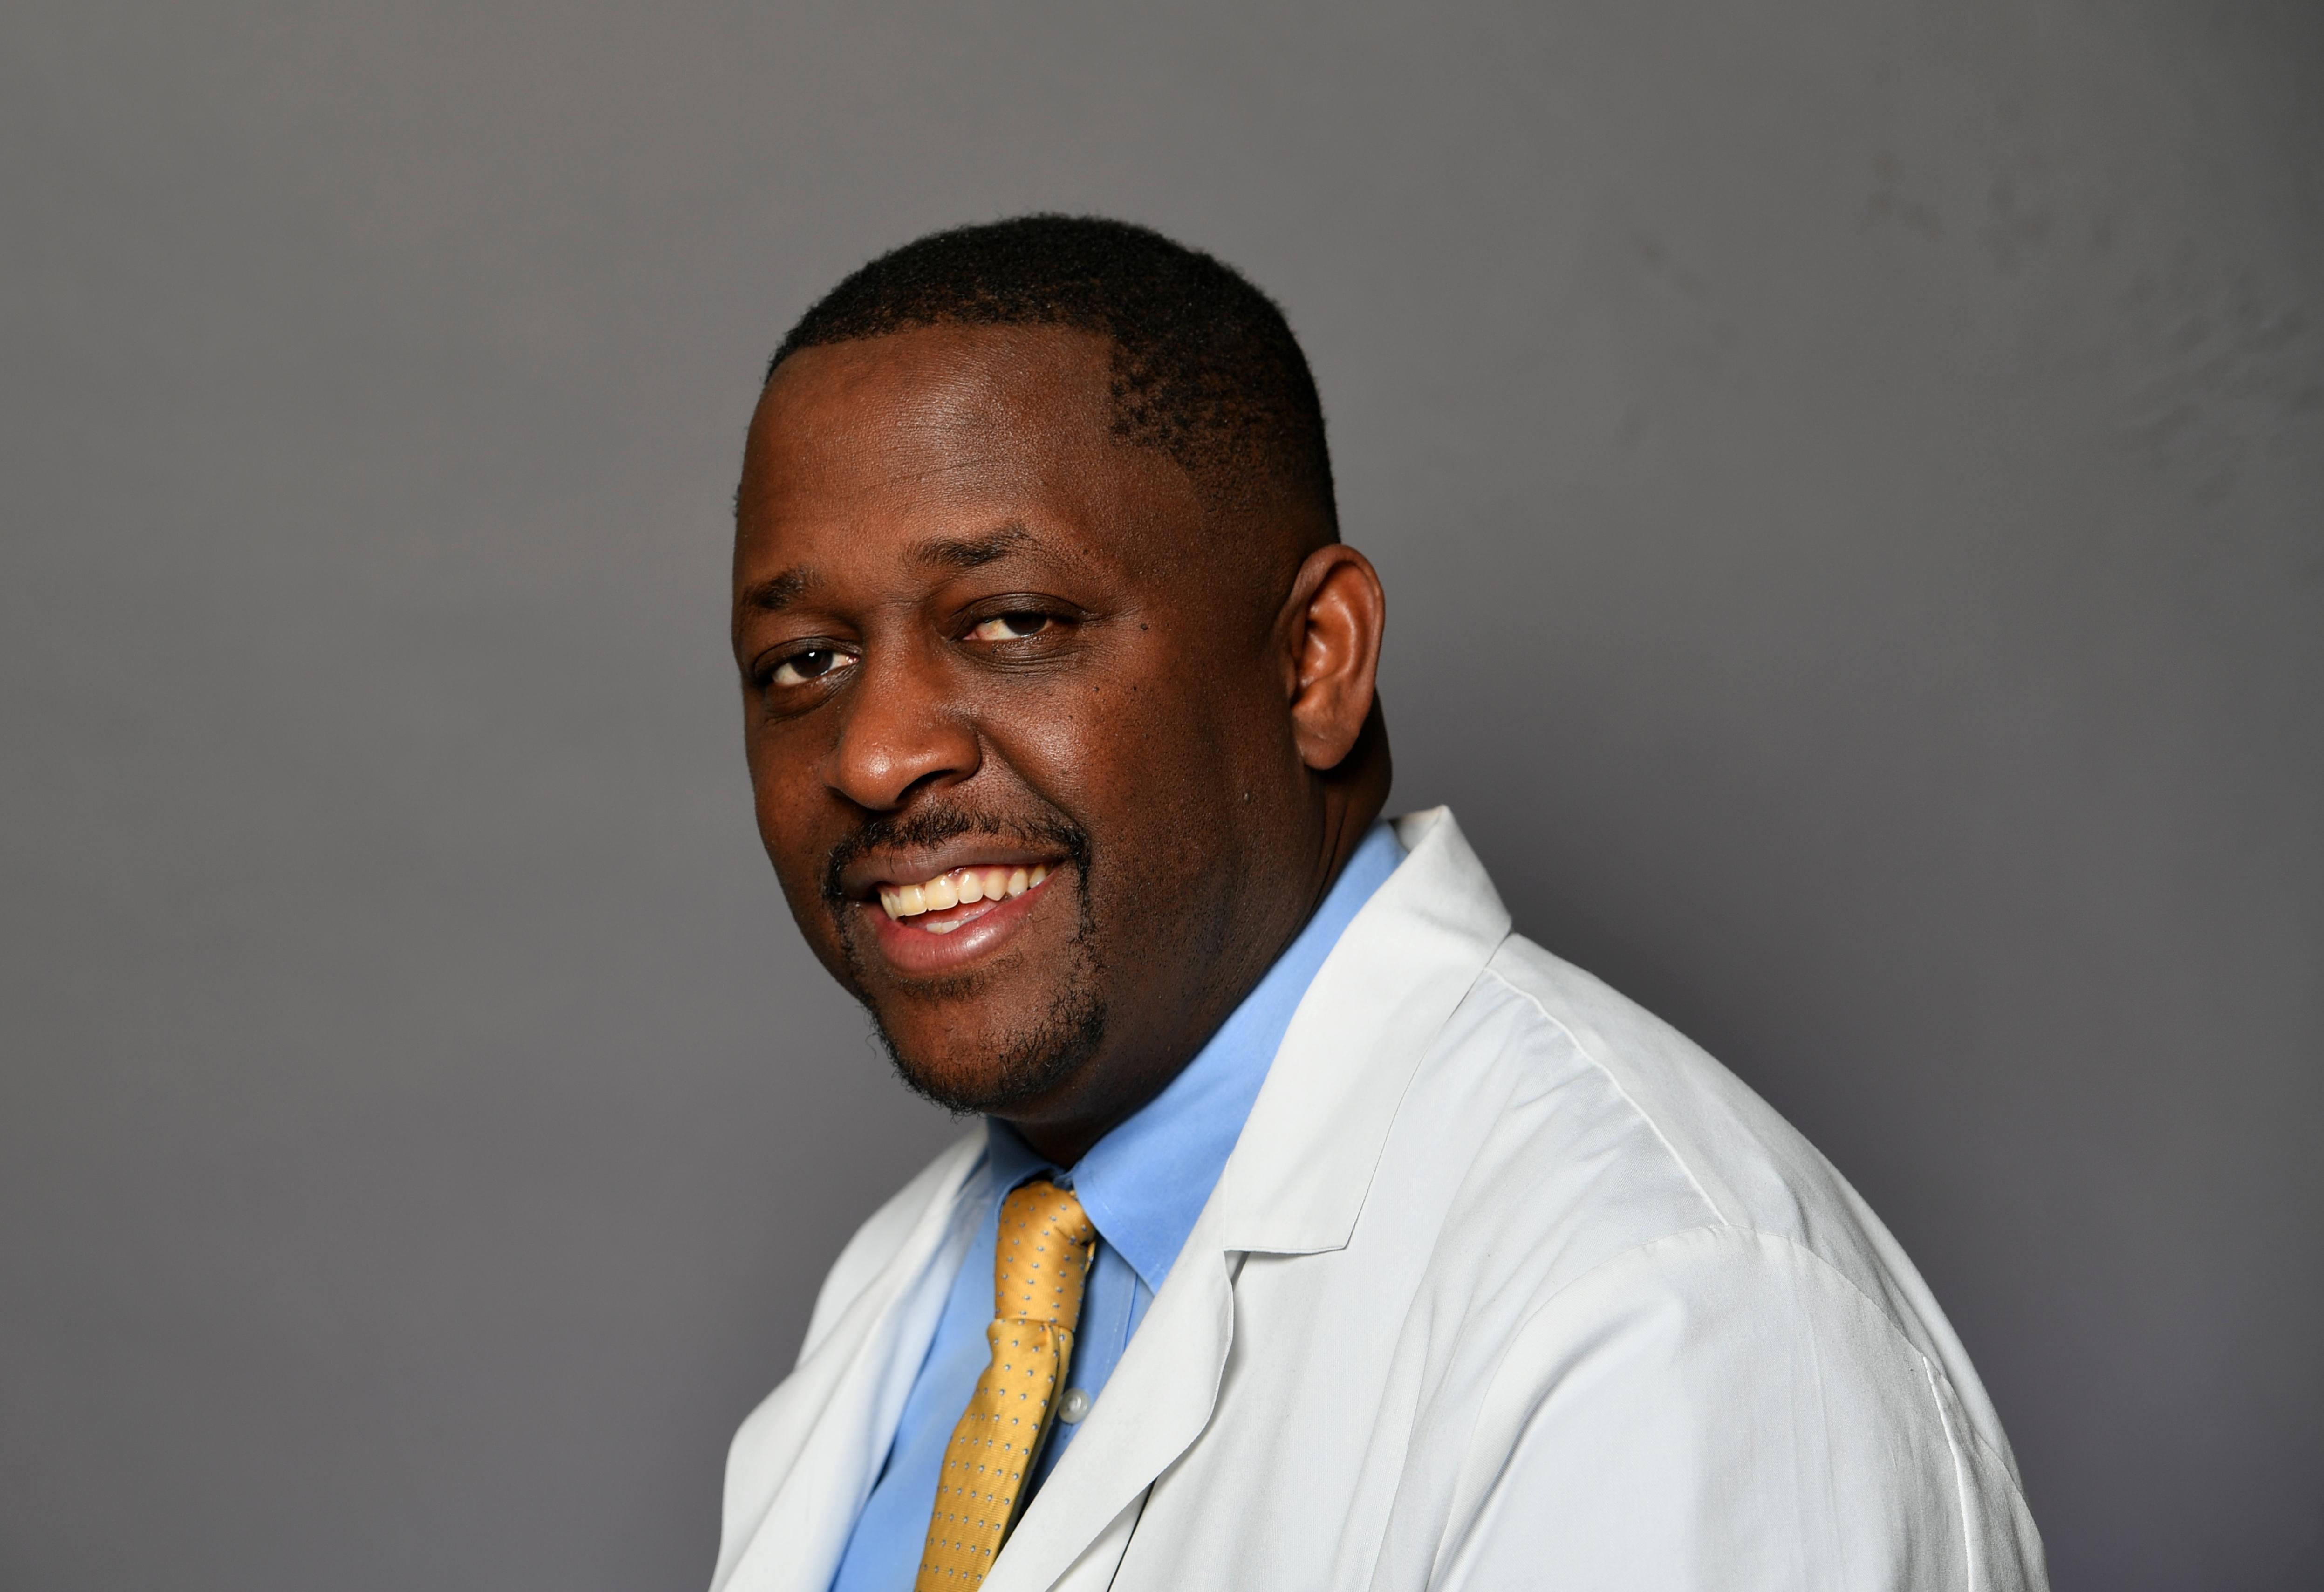 Dr. Garth Graham